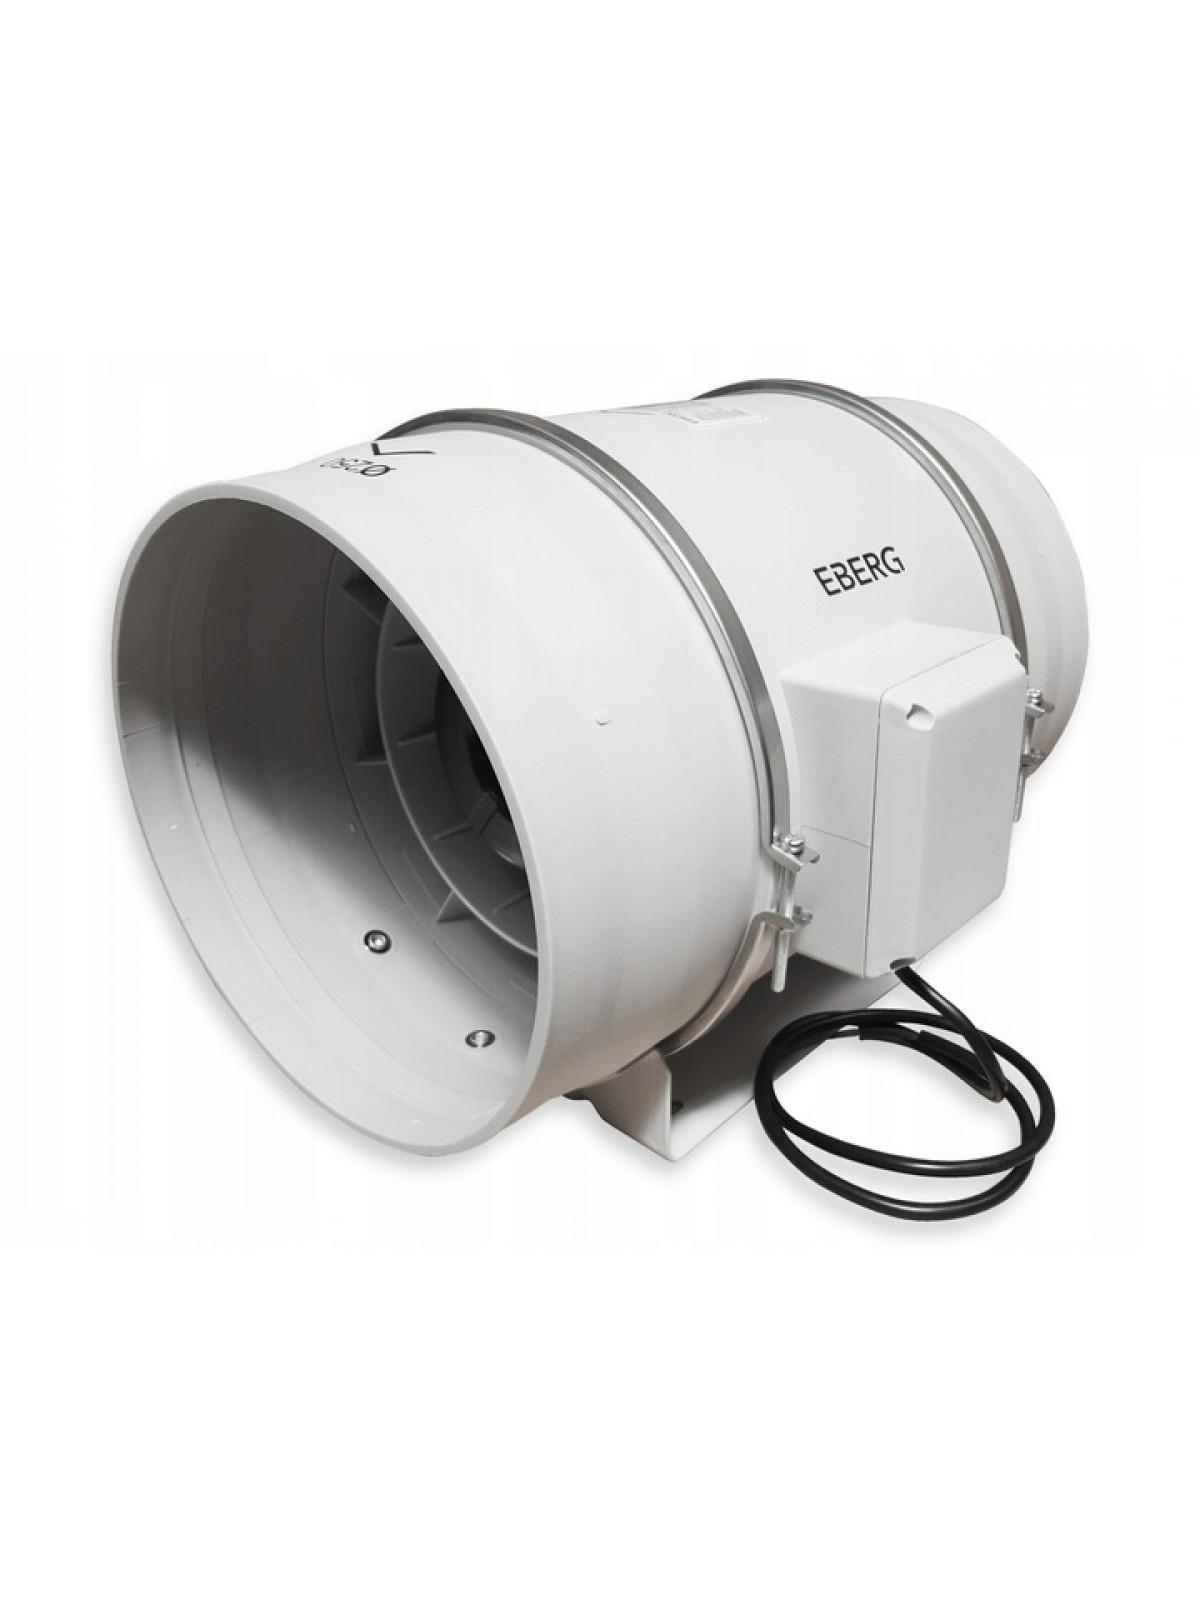 Монтаж канального вентилятора от 1000 до 1700 м3/ч